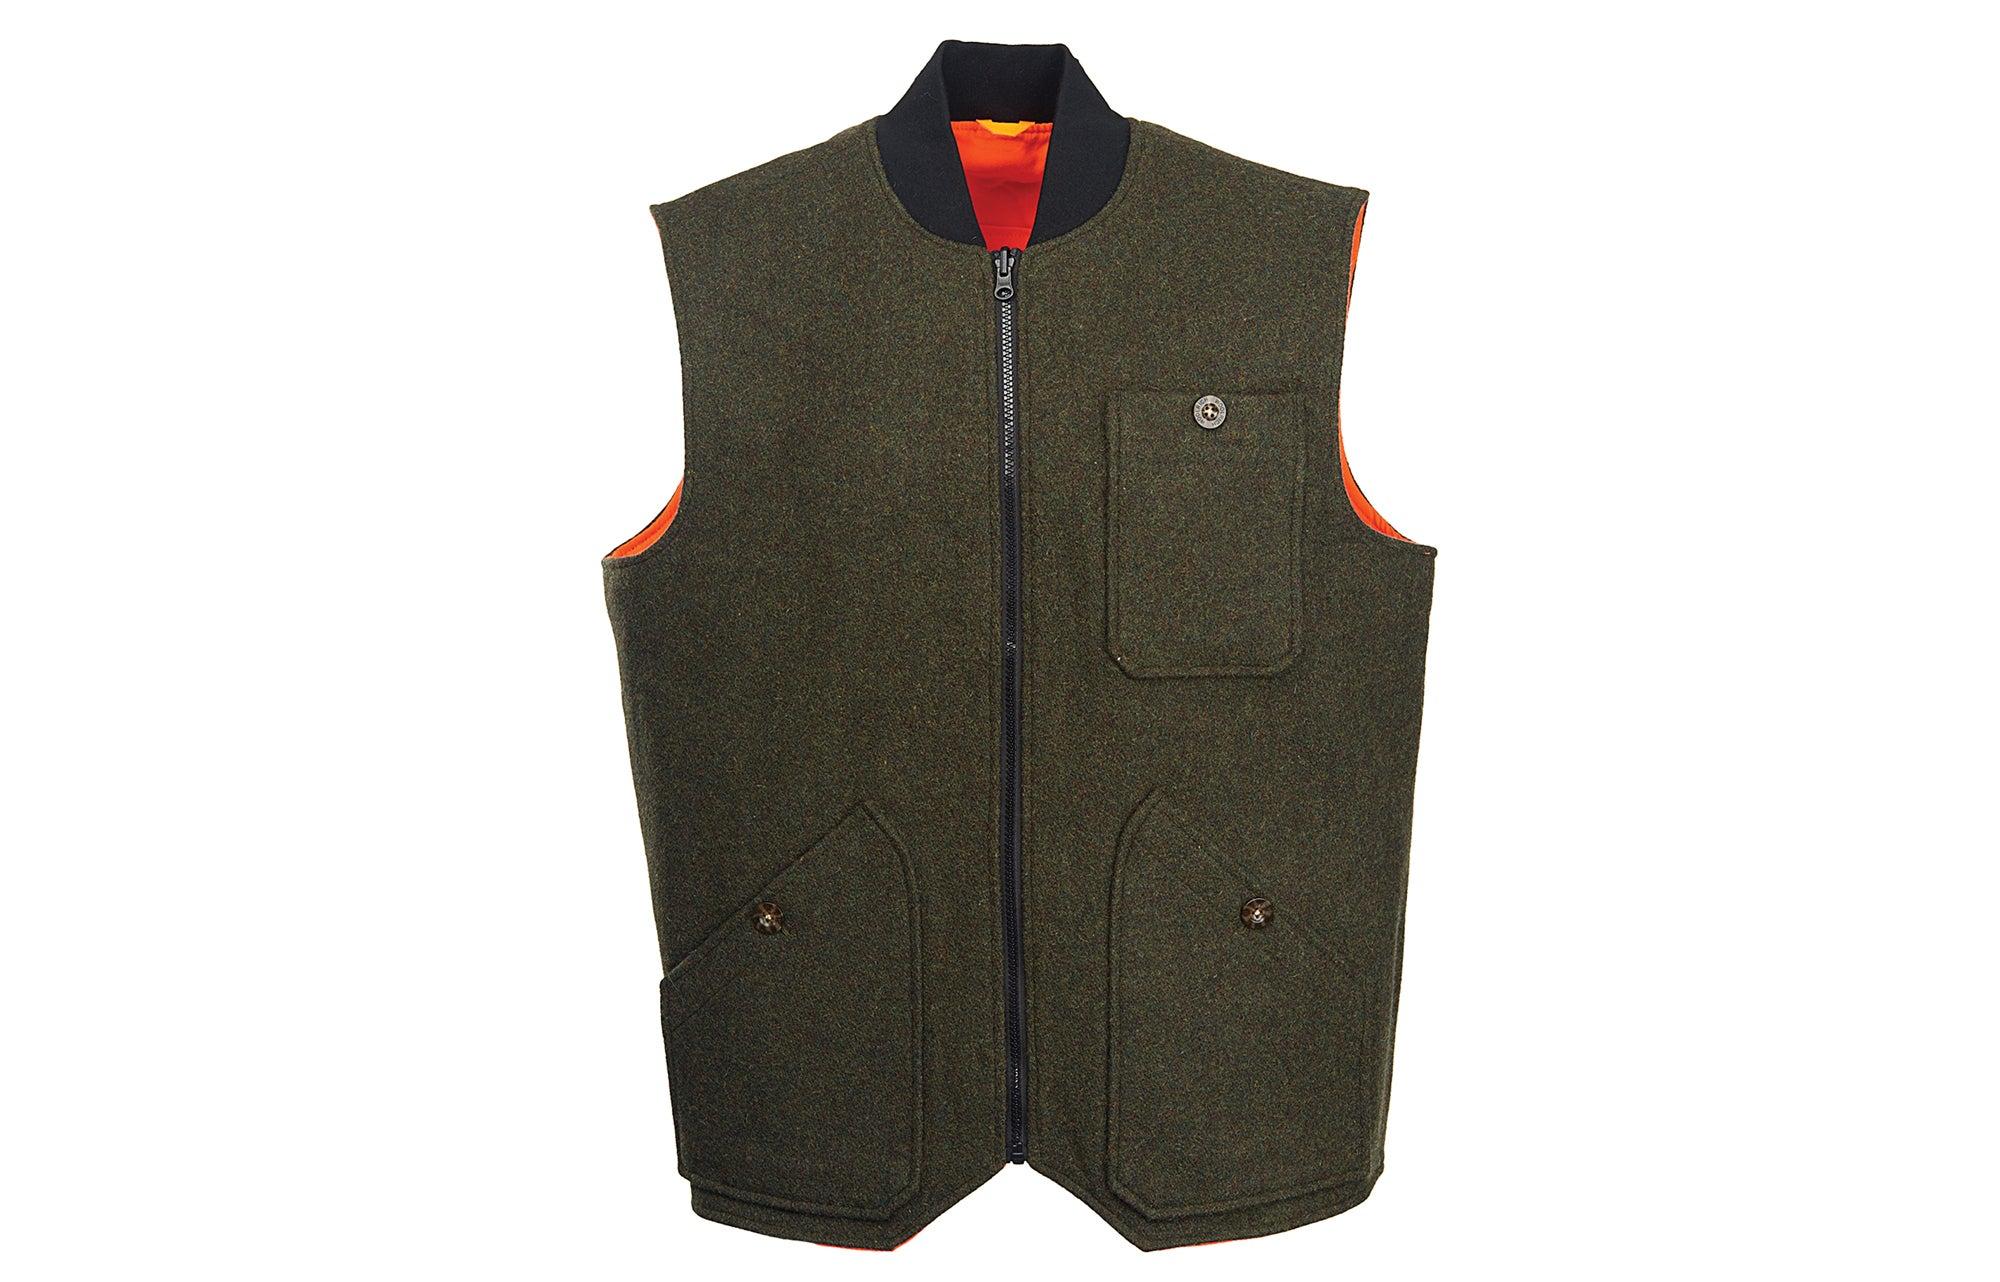 Woolrich Men's Reversible Hunting Vest